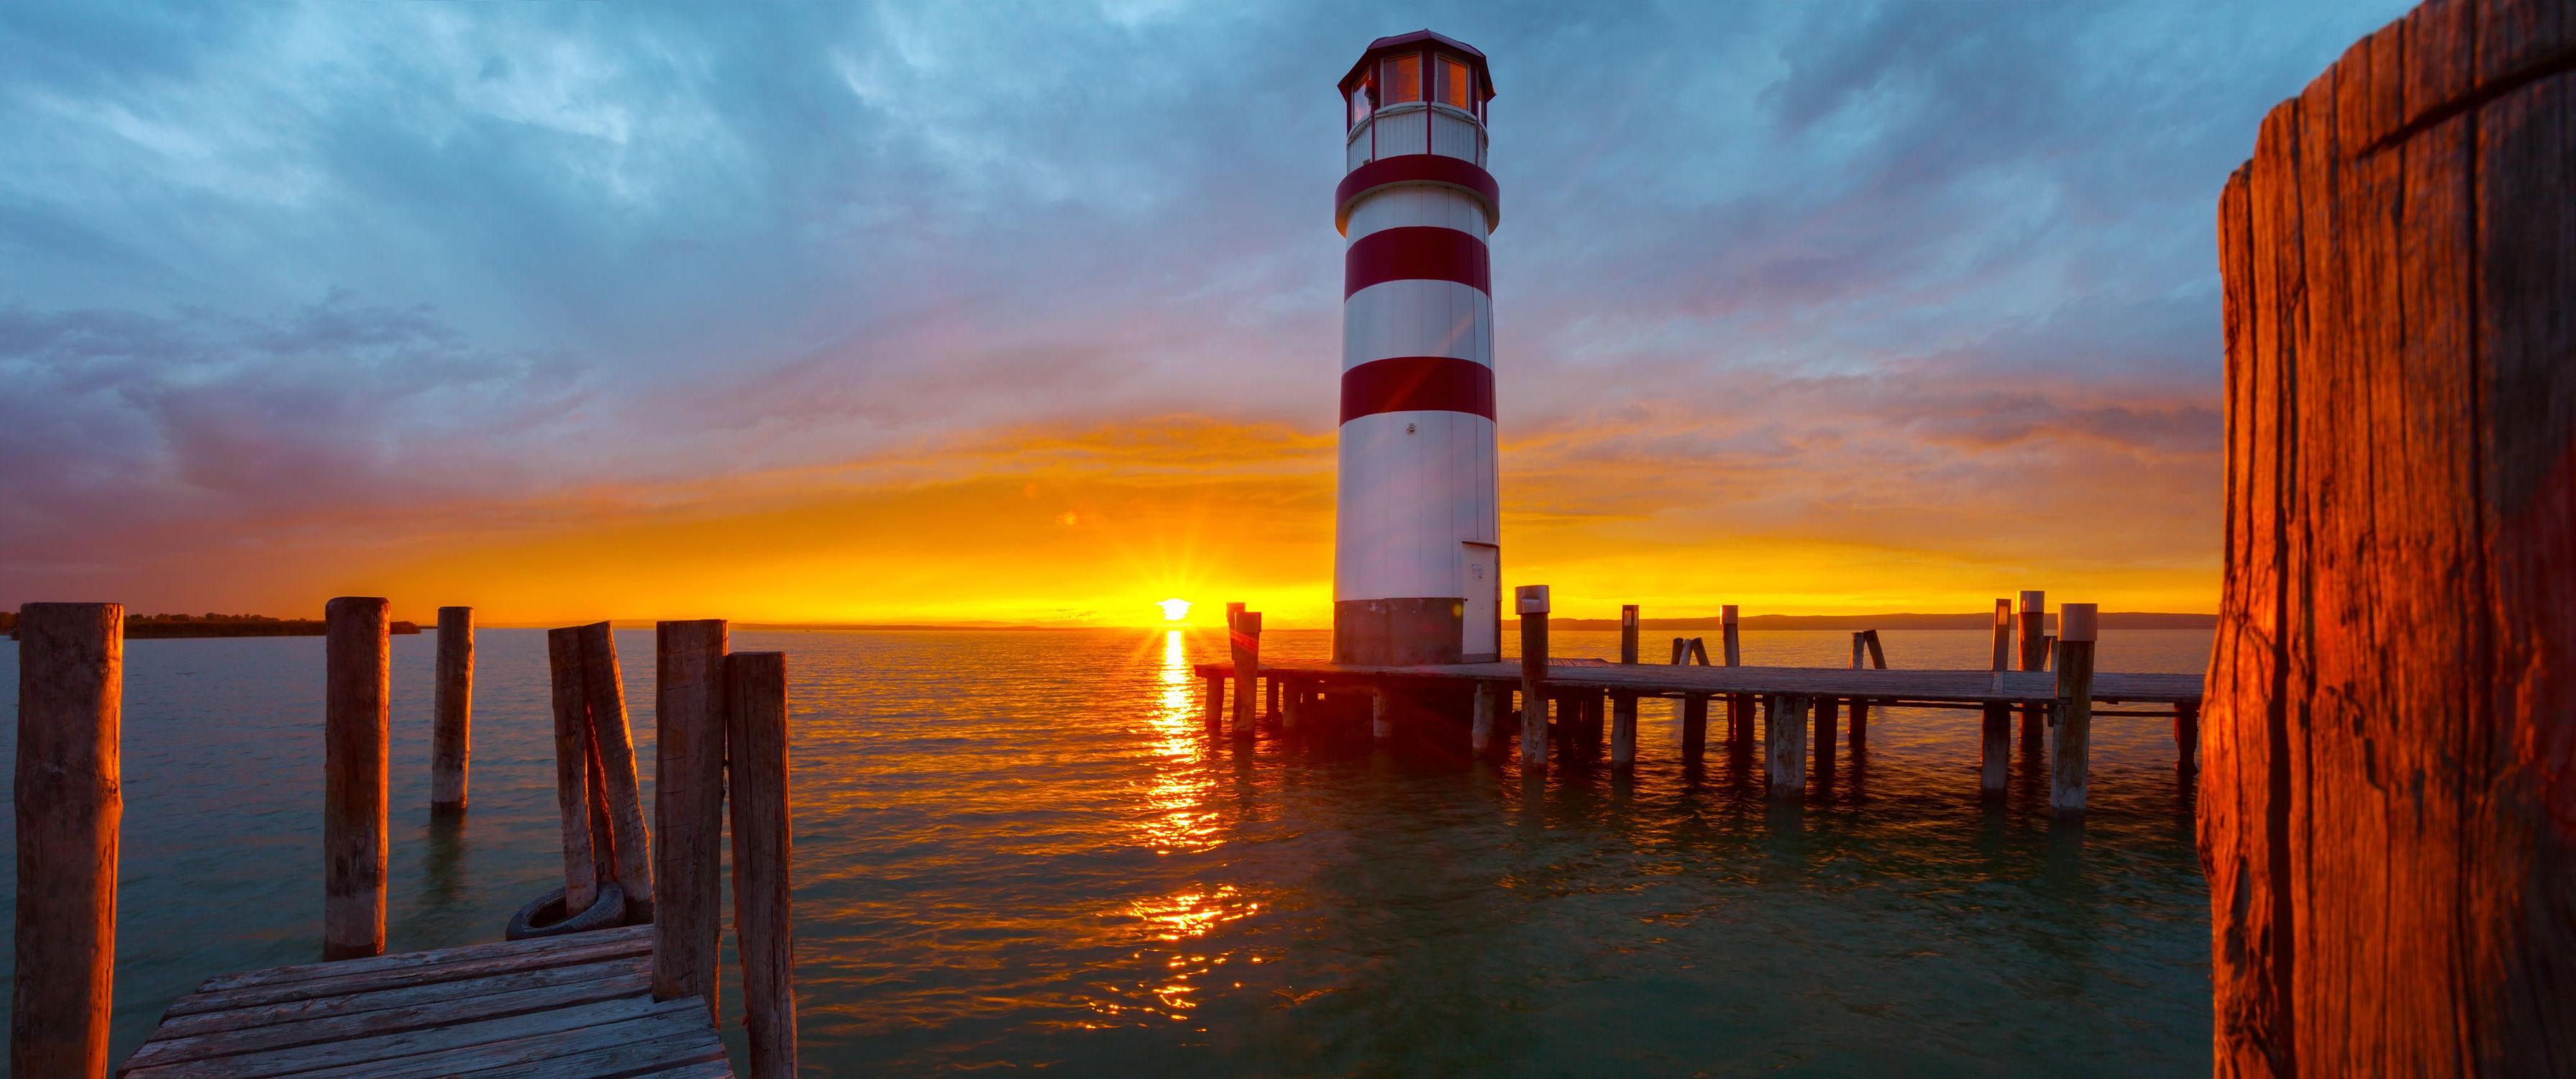 Bild mit Natur, Wasser, Gewässer, Sonnenuntergang, Sonnenaufgang, Steg, Am Meer, Leuchtturm, ozean